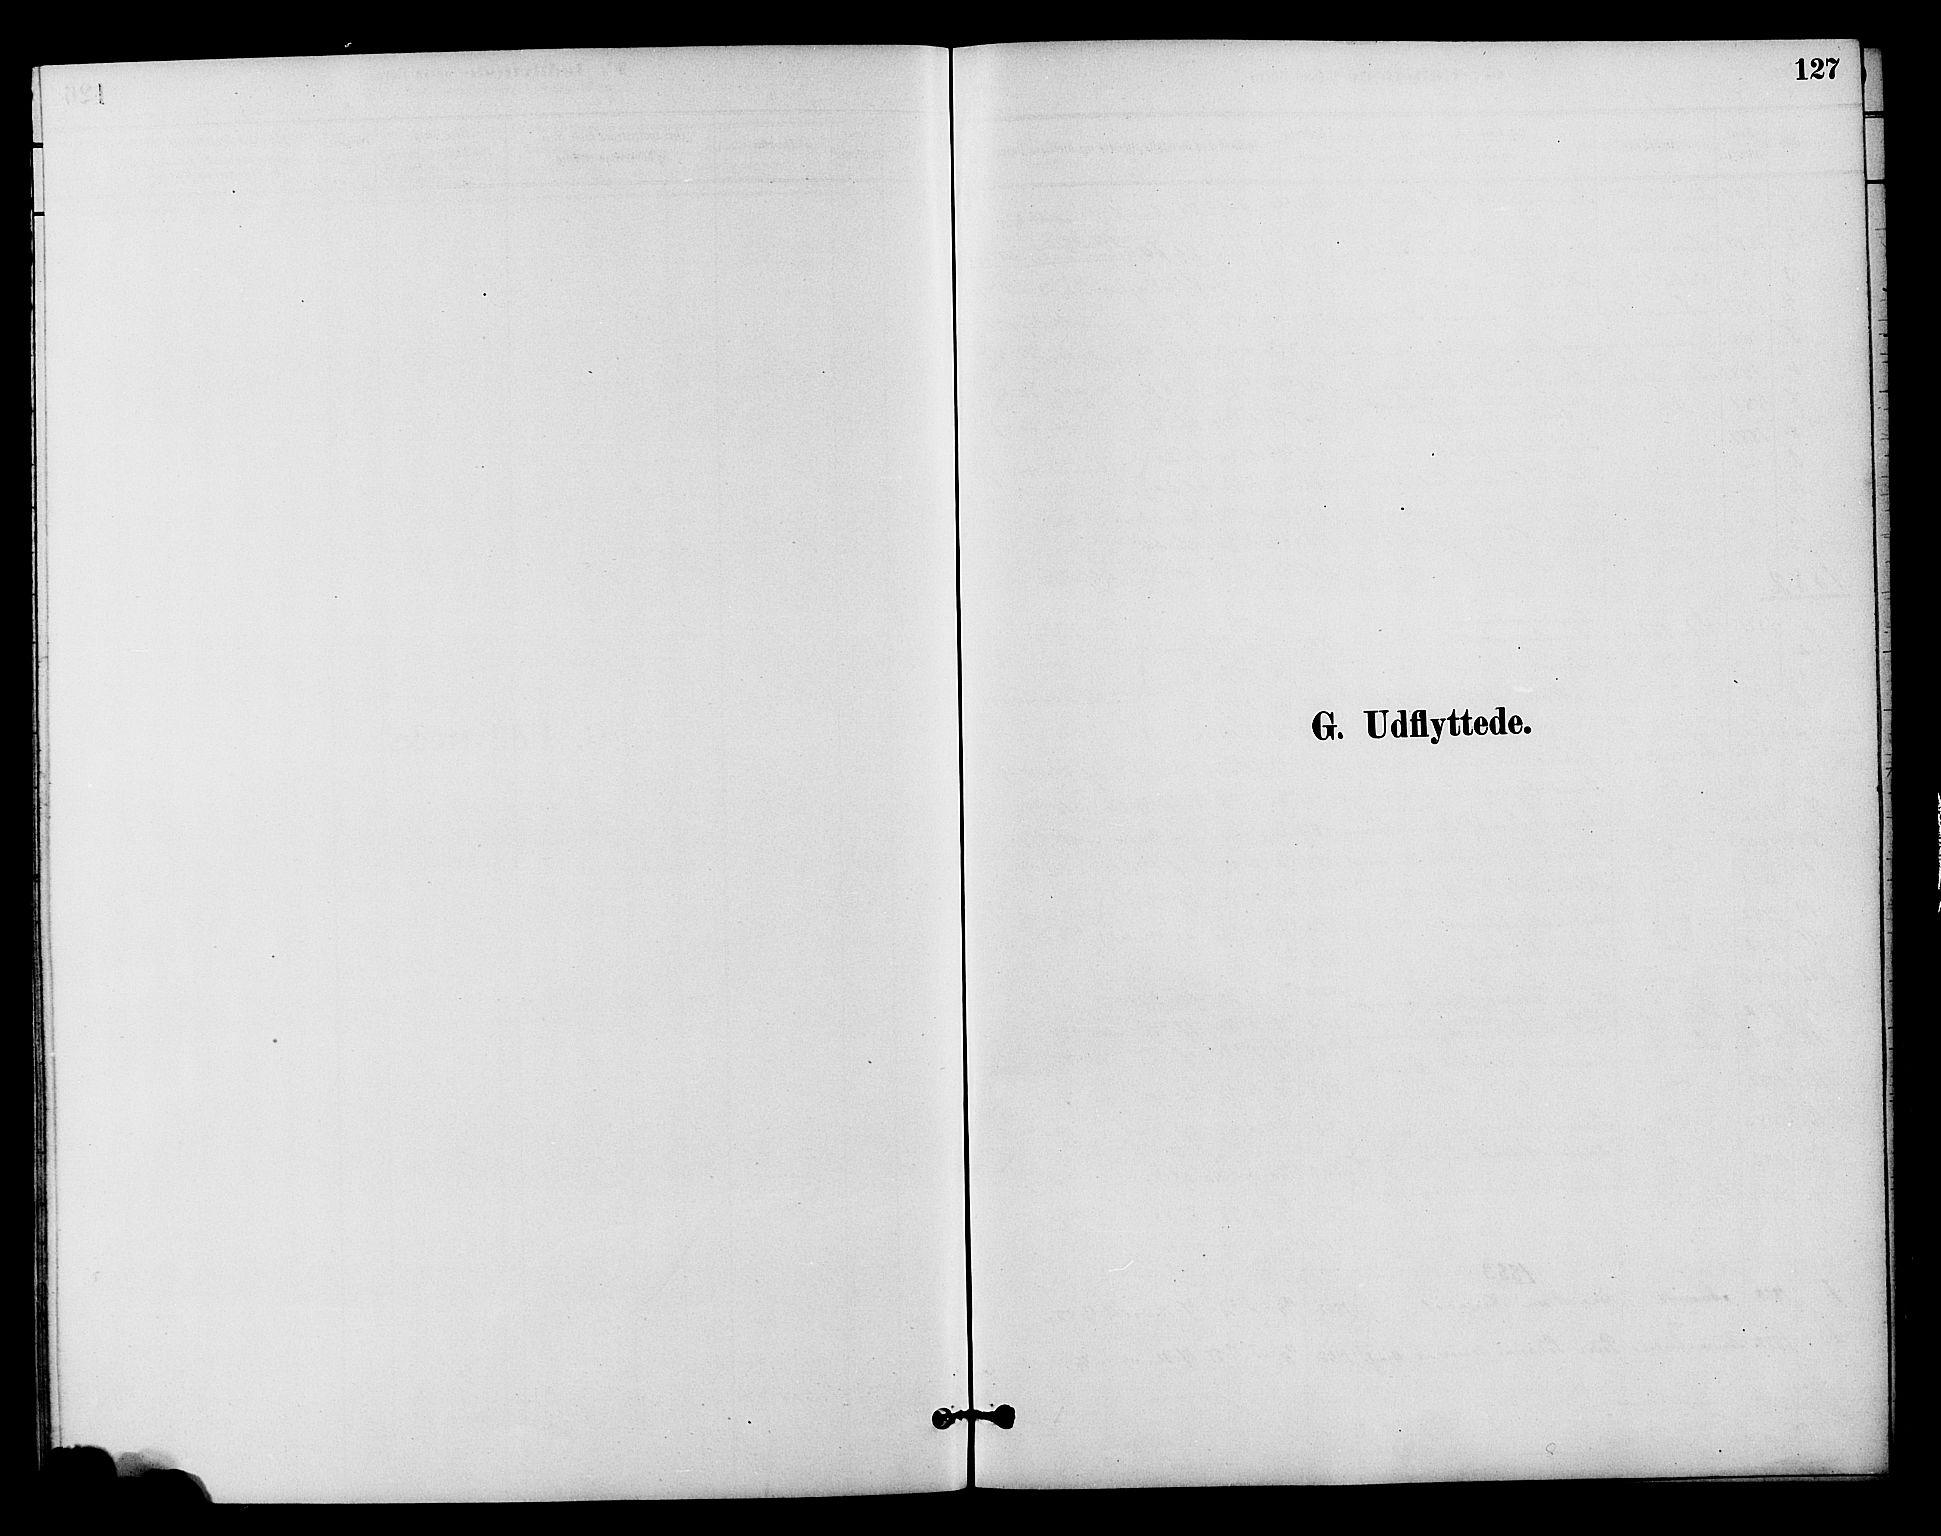 SAH, Vestre Slidre prestekontor, Klokkerbok nr. 4, 1881-1912, s. 127